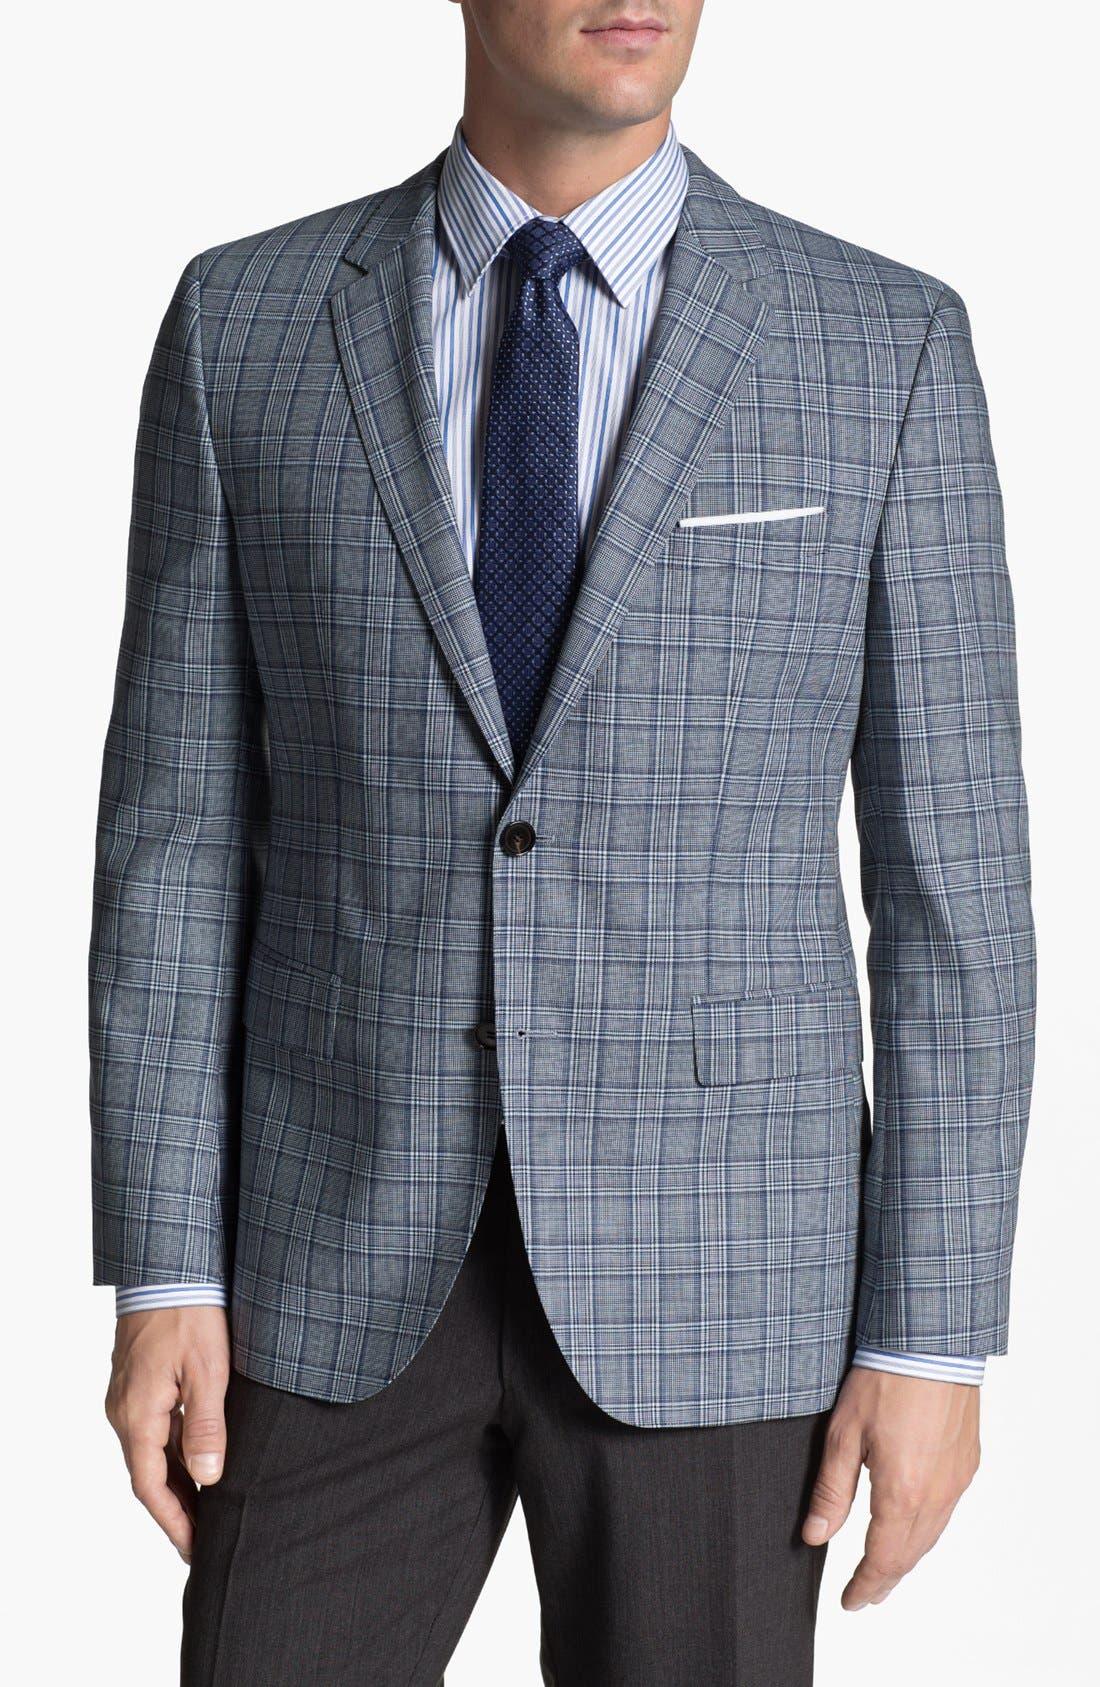 Alternate Image 1 Selected - BOSS HUGO BOSS 'James' Trim Fit Plaid Sportcoat